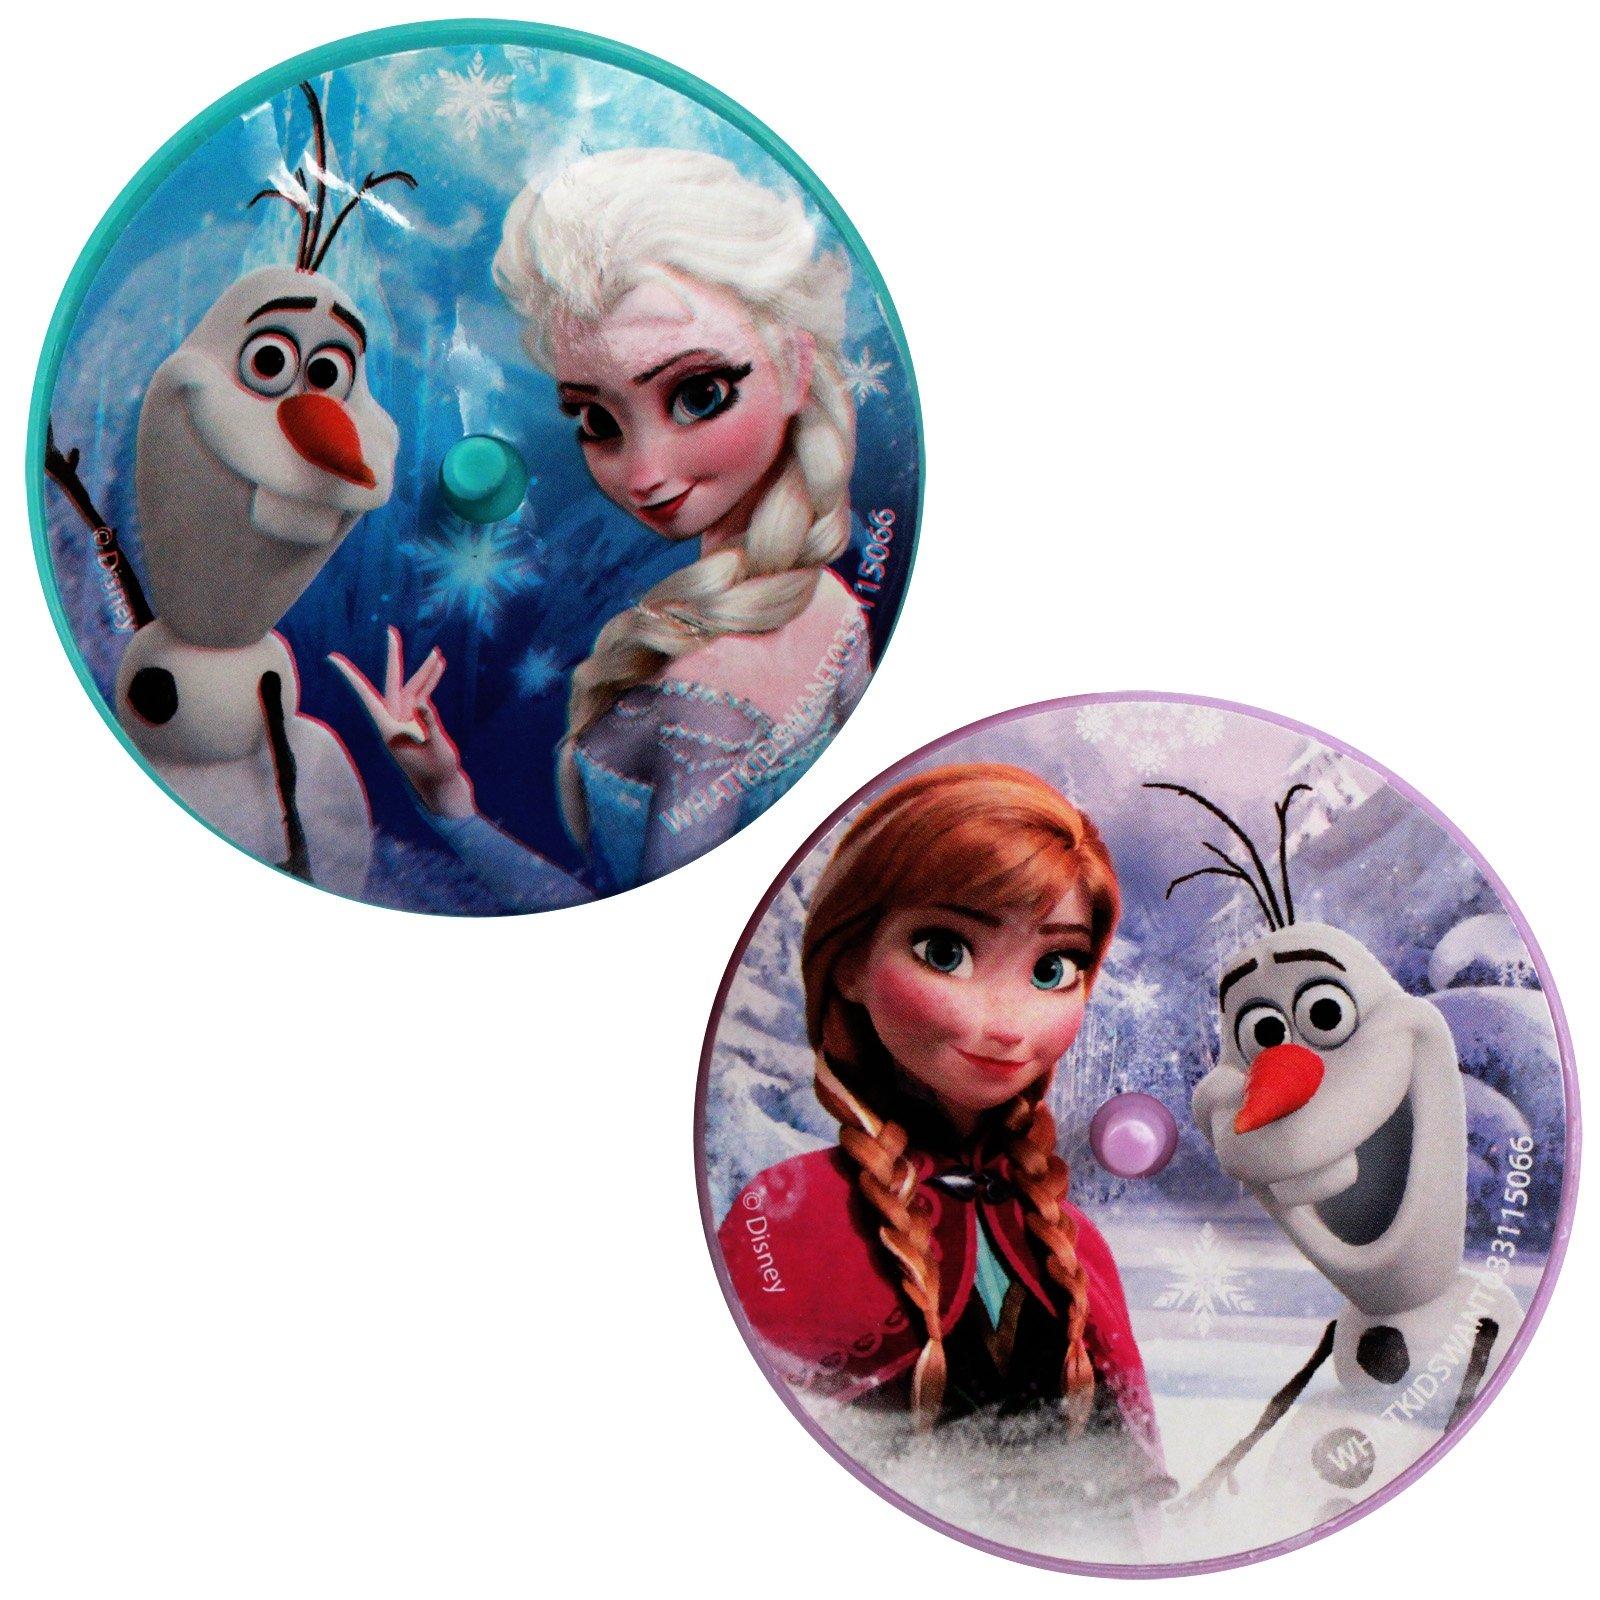 Disney Frozen Spinning Top 2pk Girls Toy